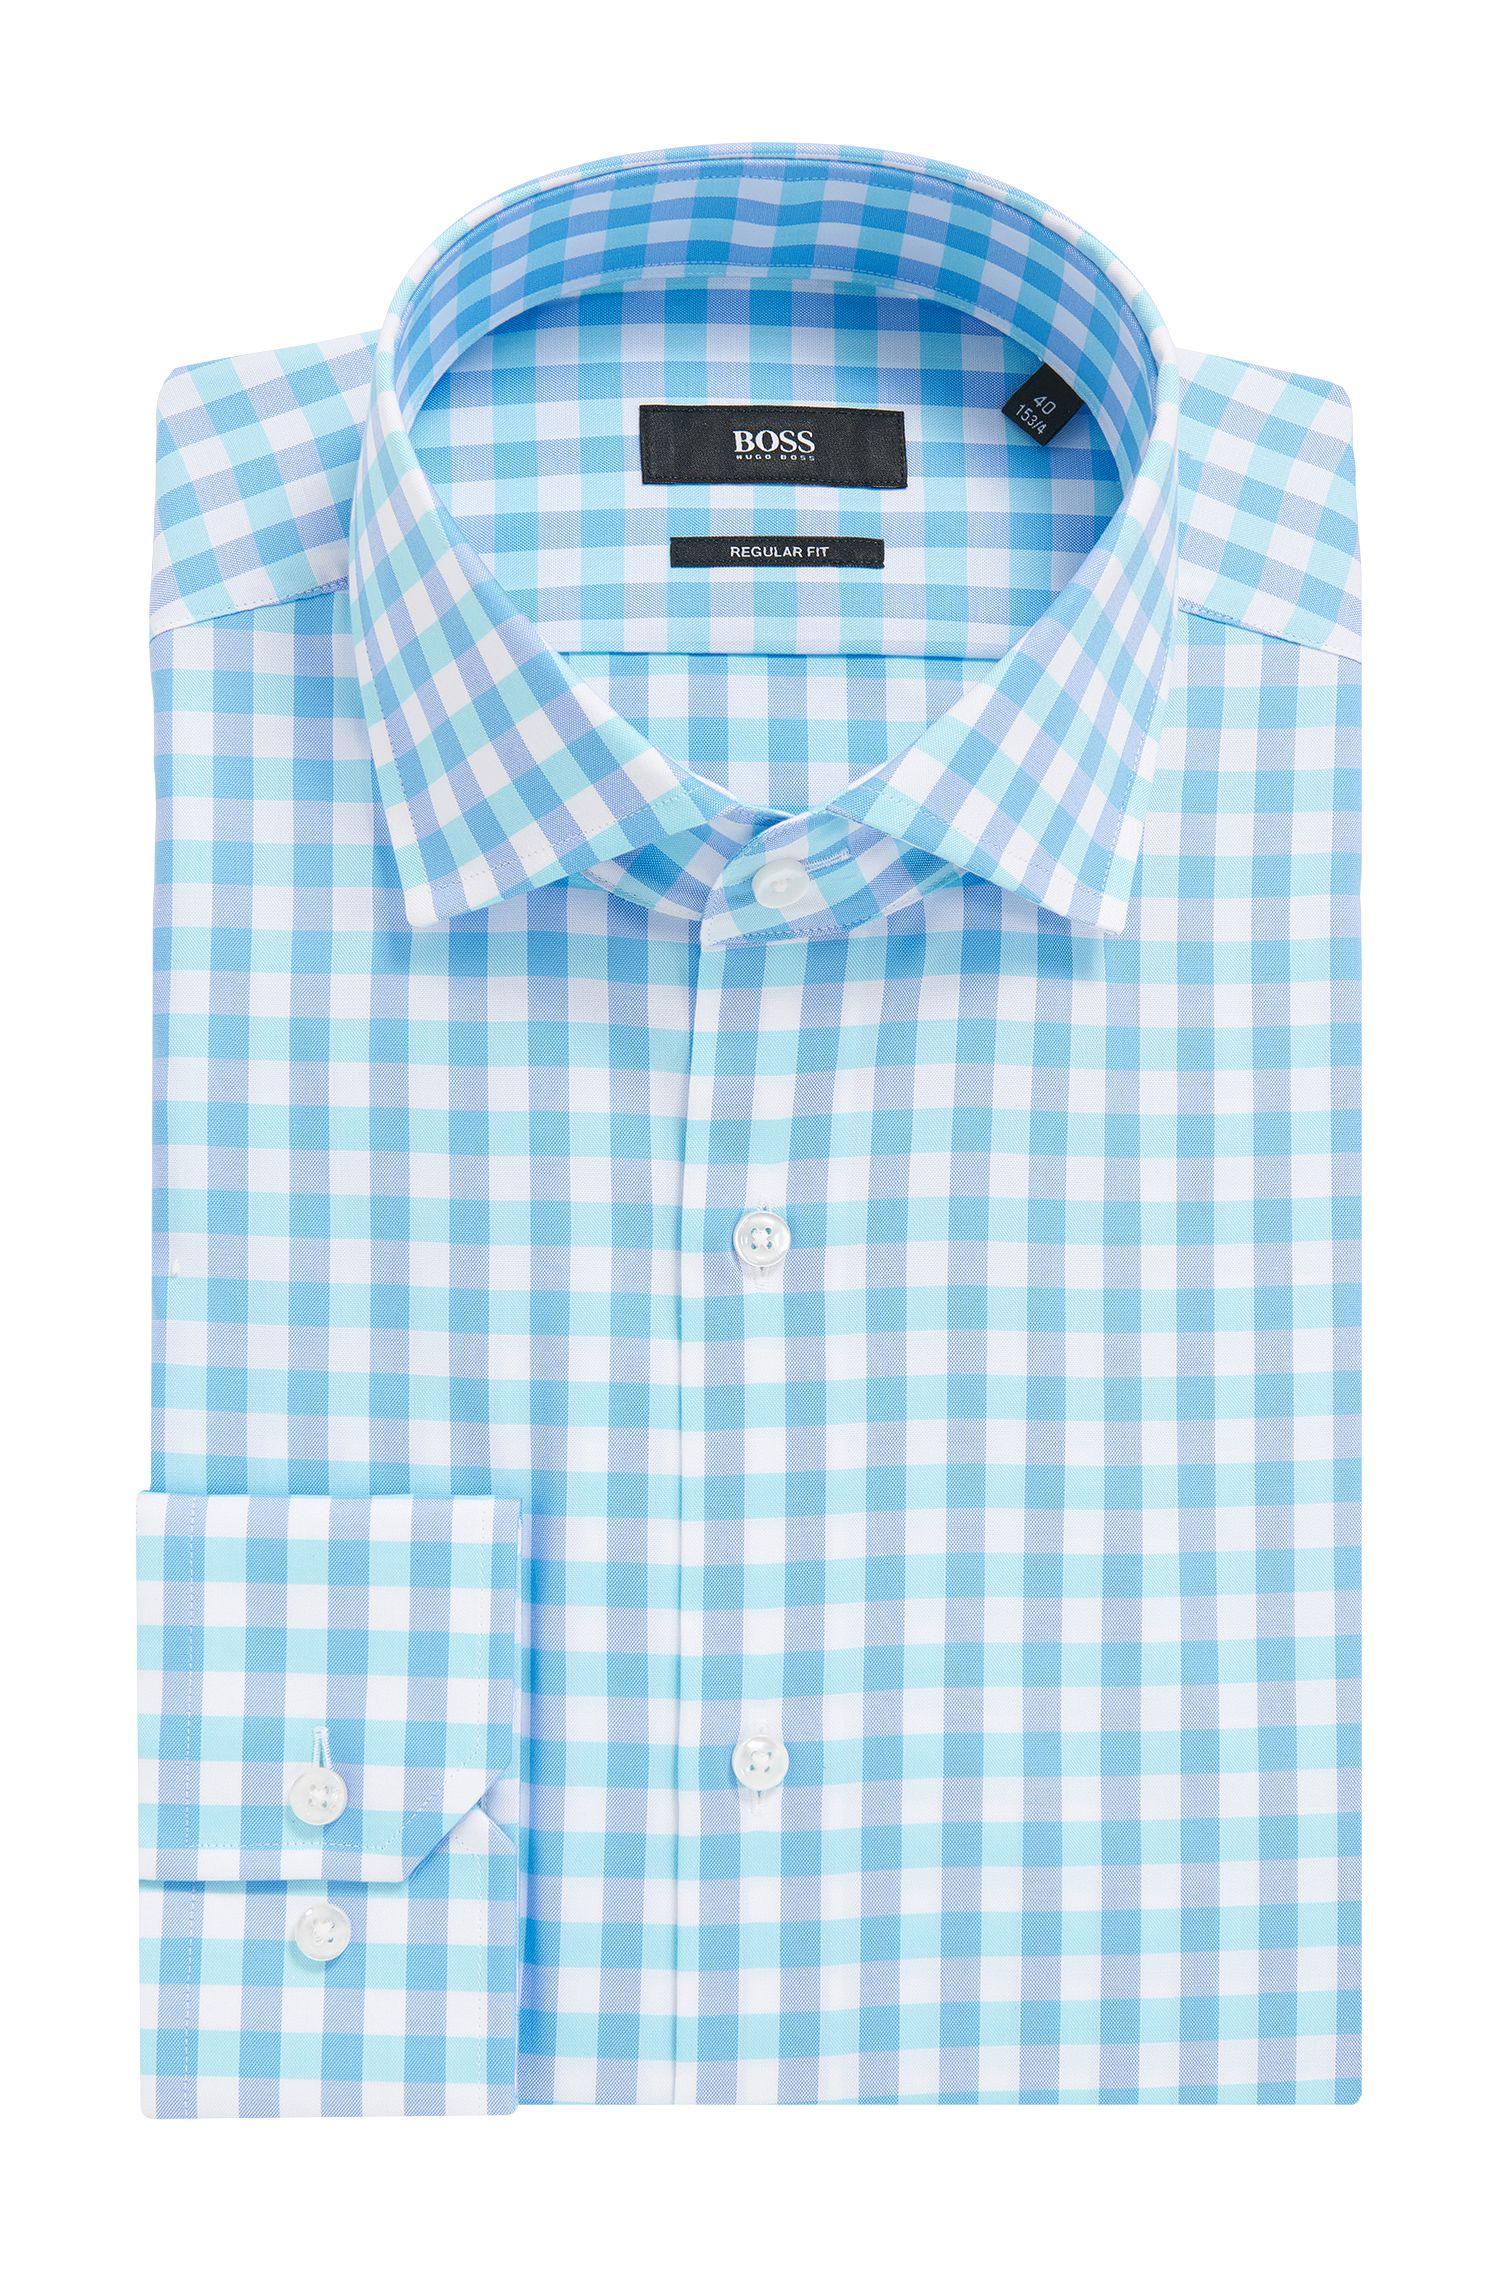 Windowpane Cotton Dress Shirt, Regular FIt | Gordon